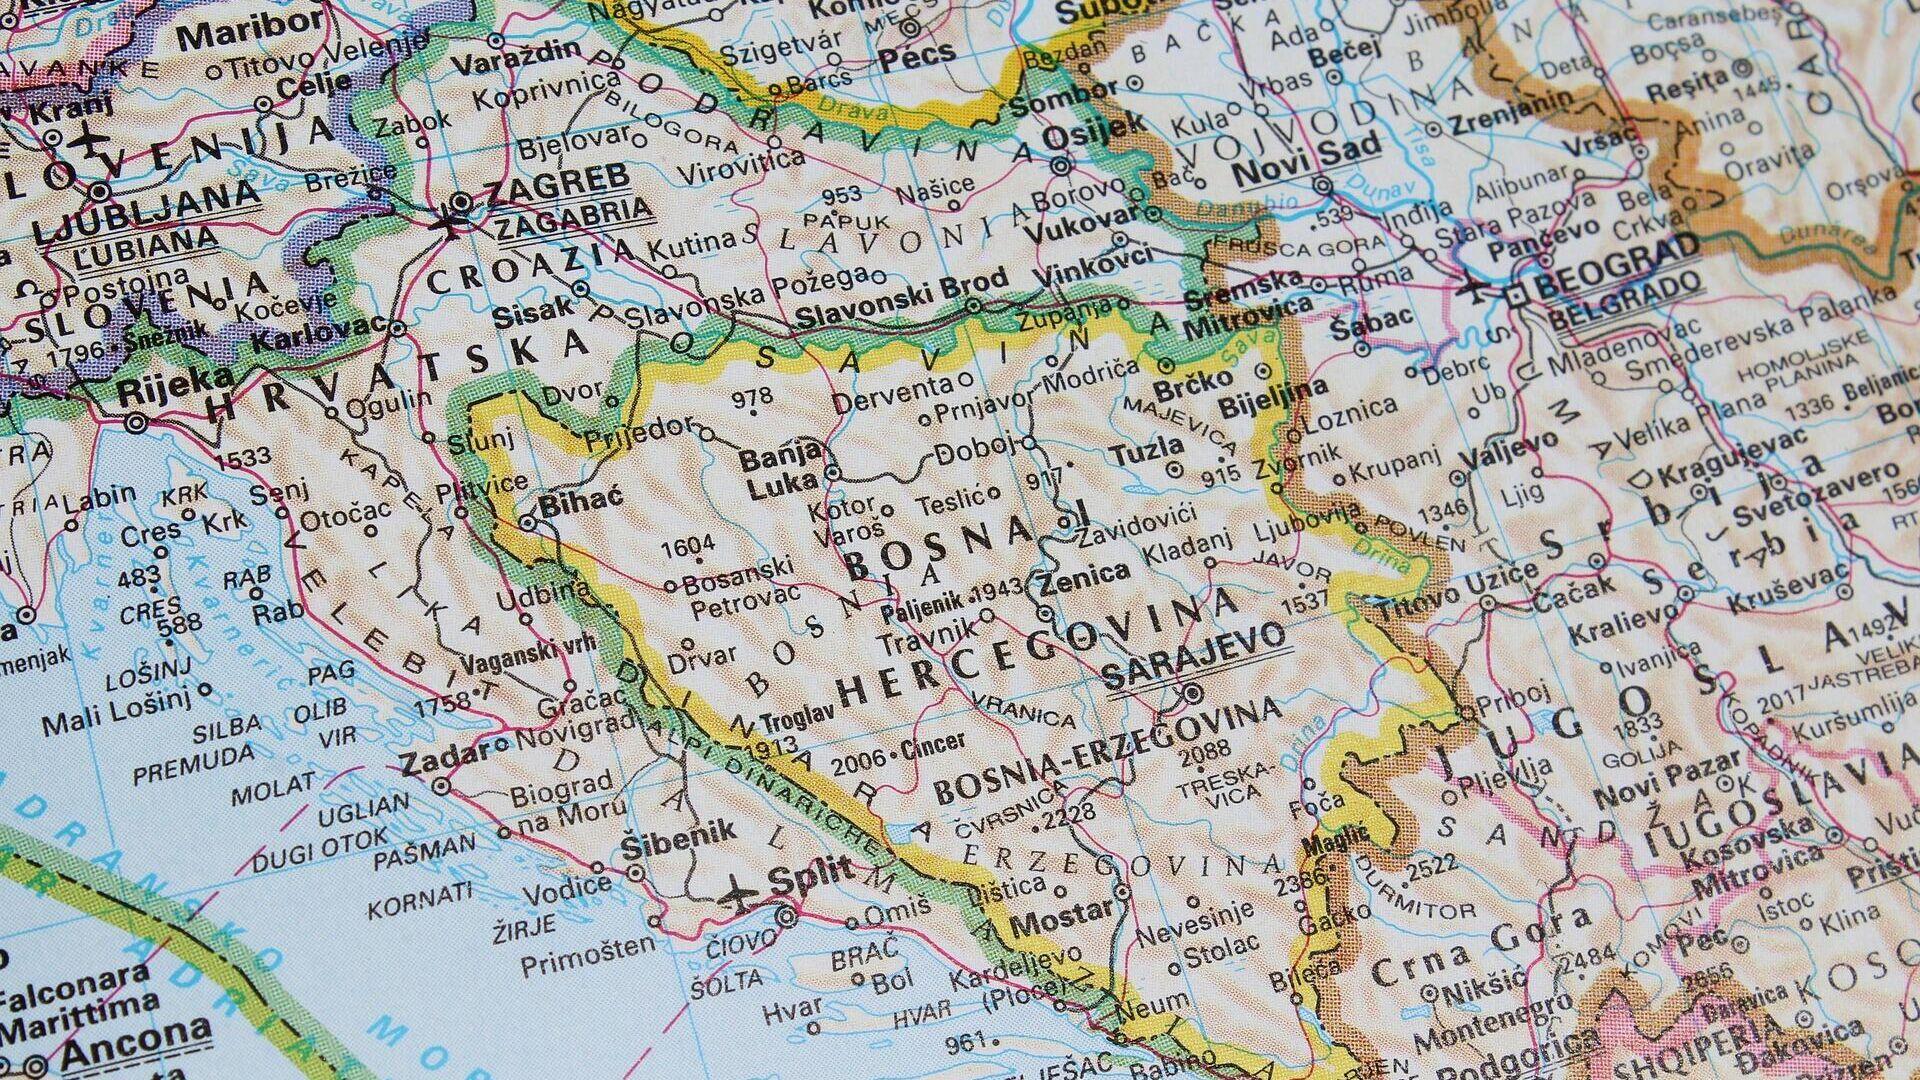 Босна и Херцеговина - Sputnik Србија, 1920, 29.07.2021